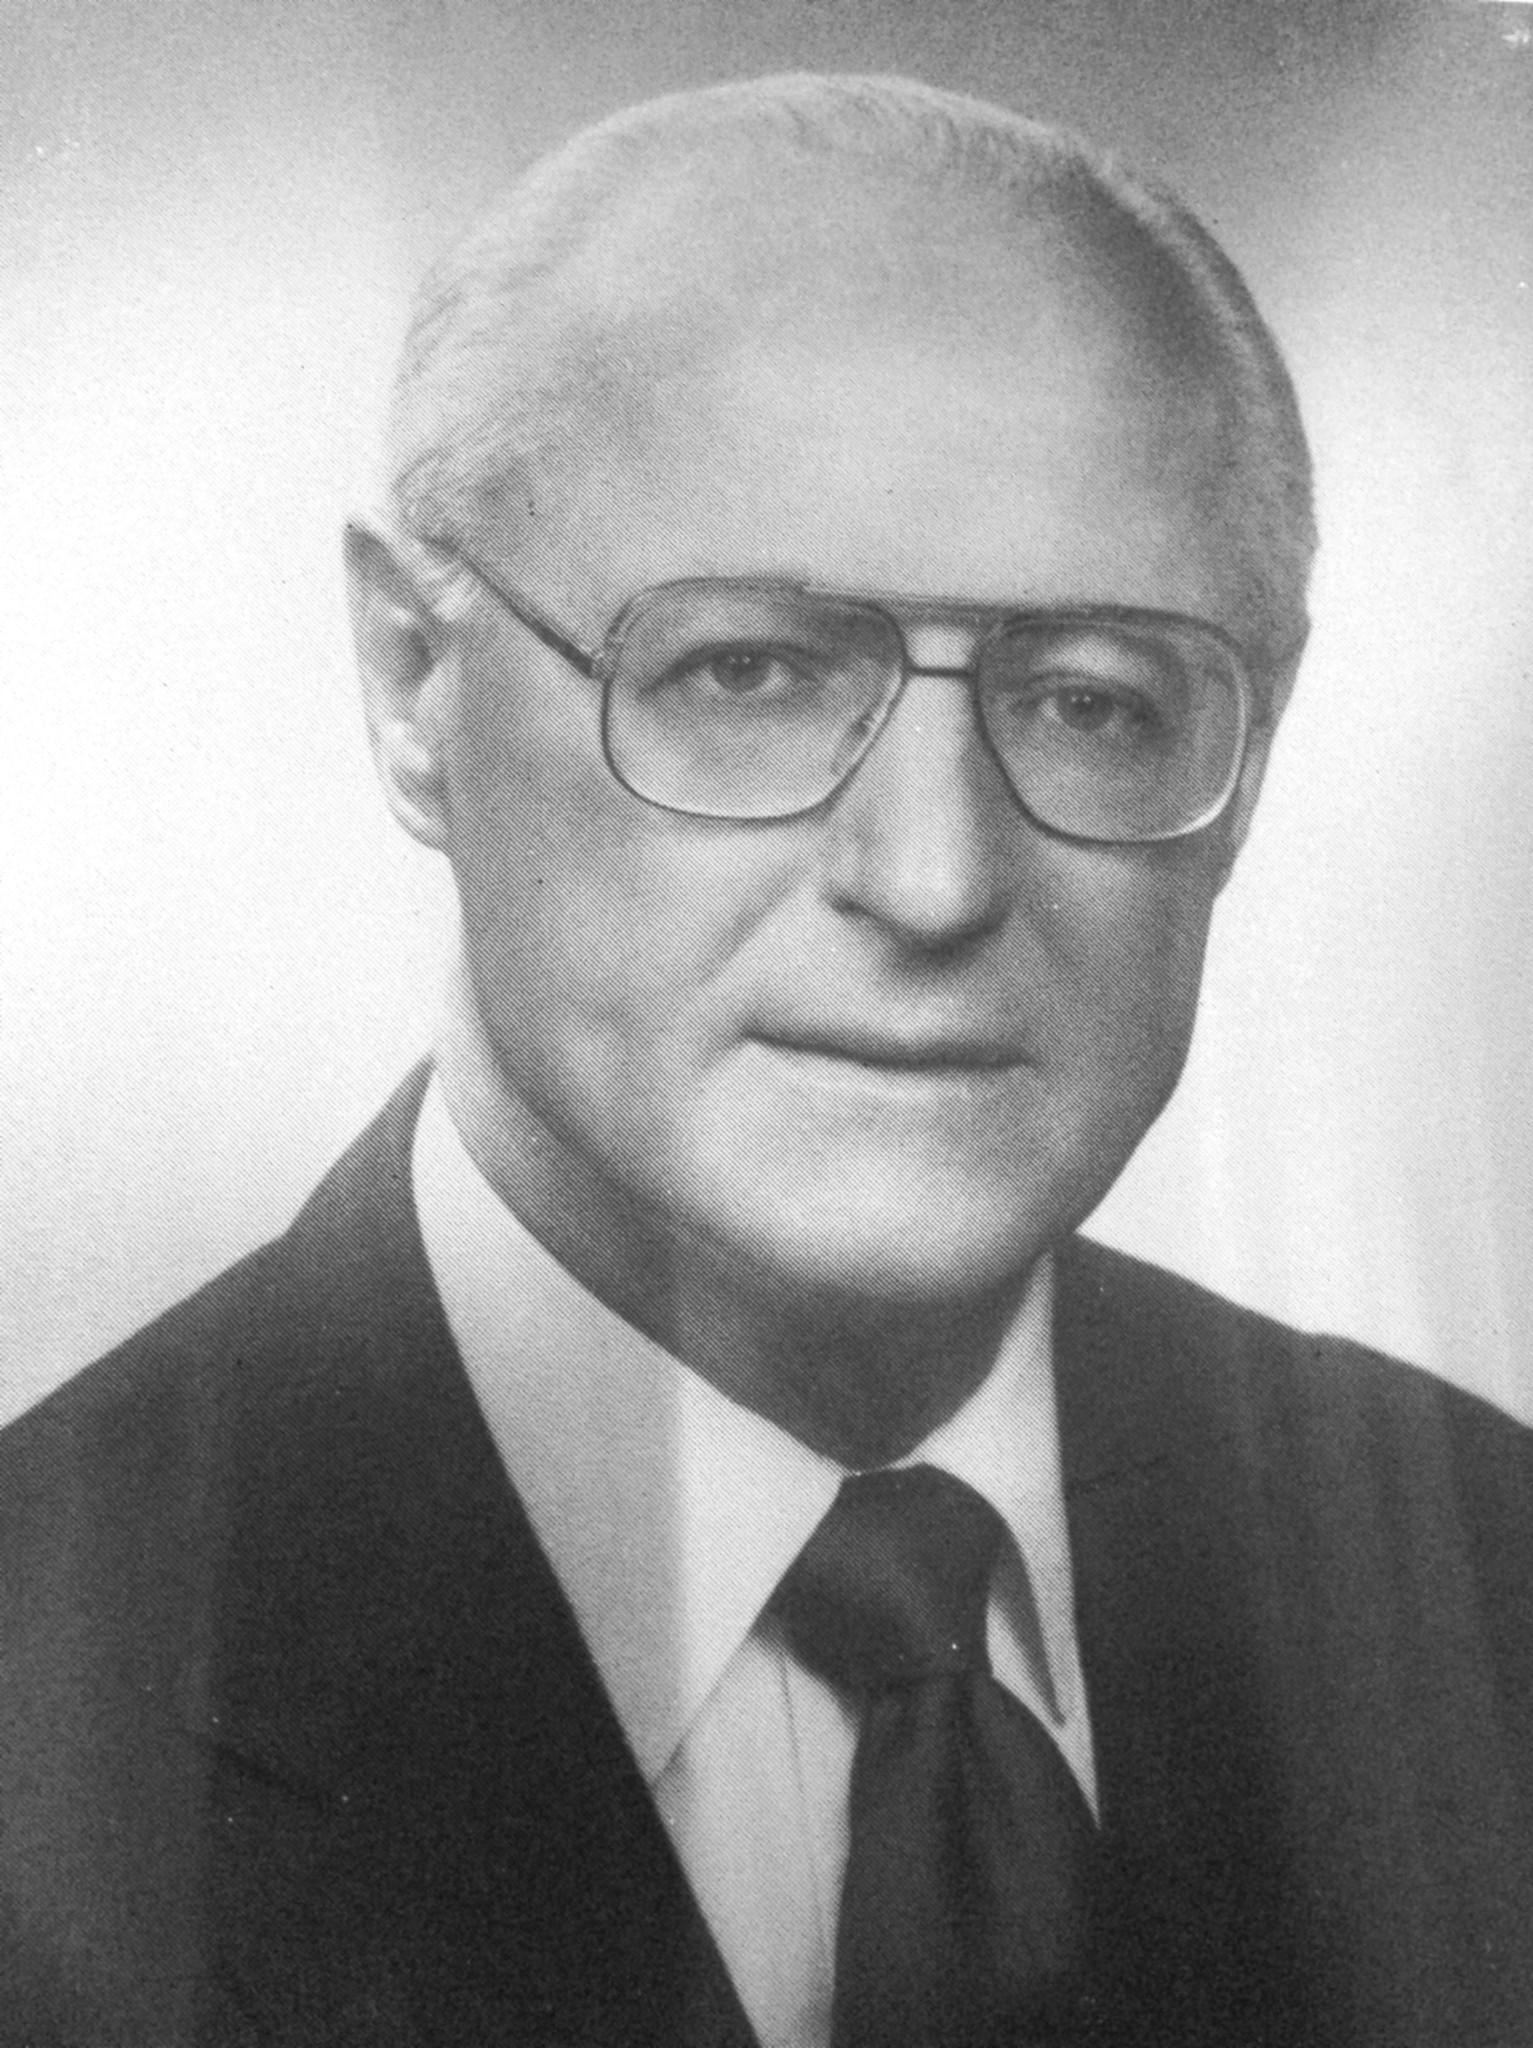 Thomas M. Gibbons